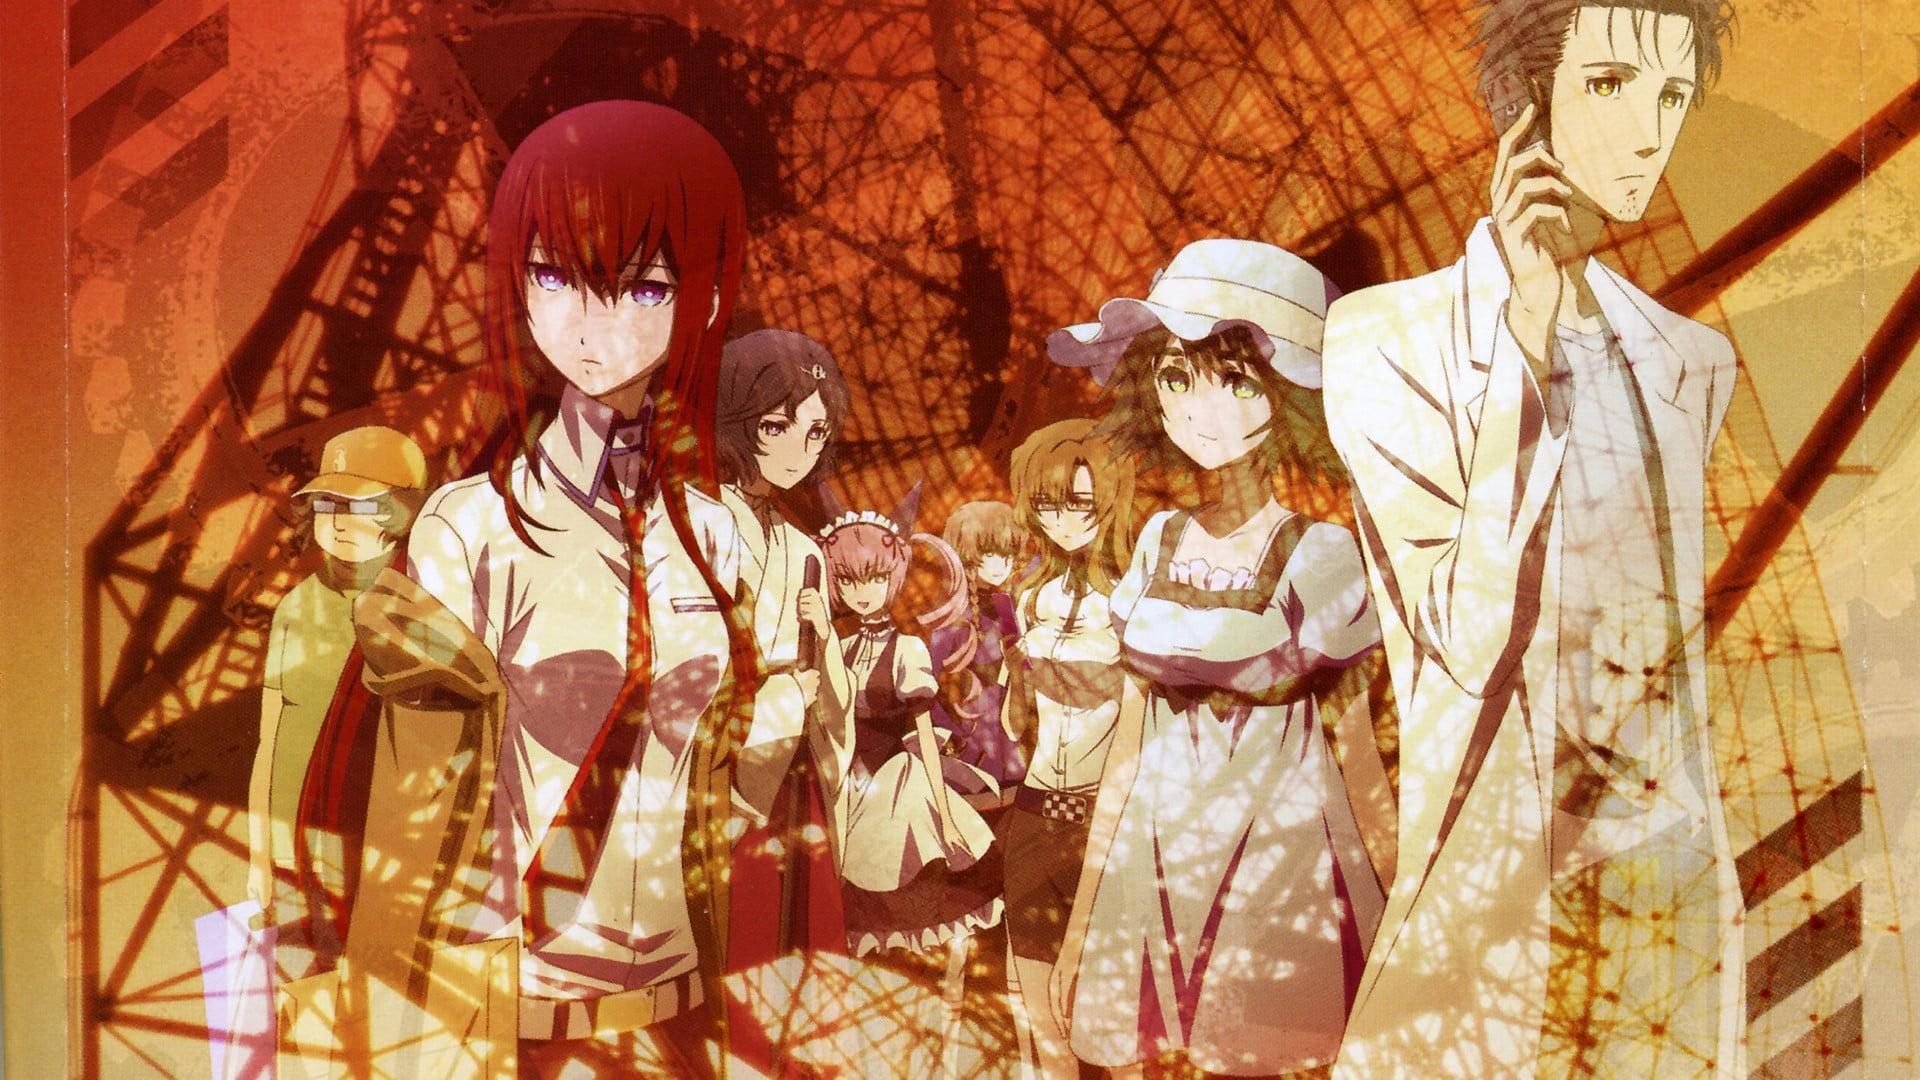 anime movie poster steins gate anime